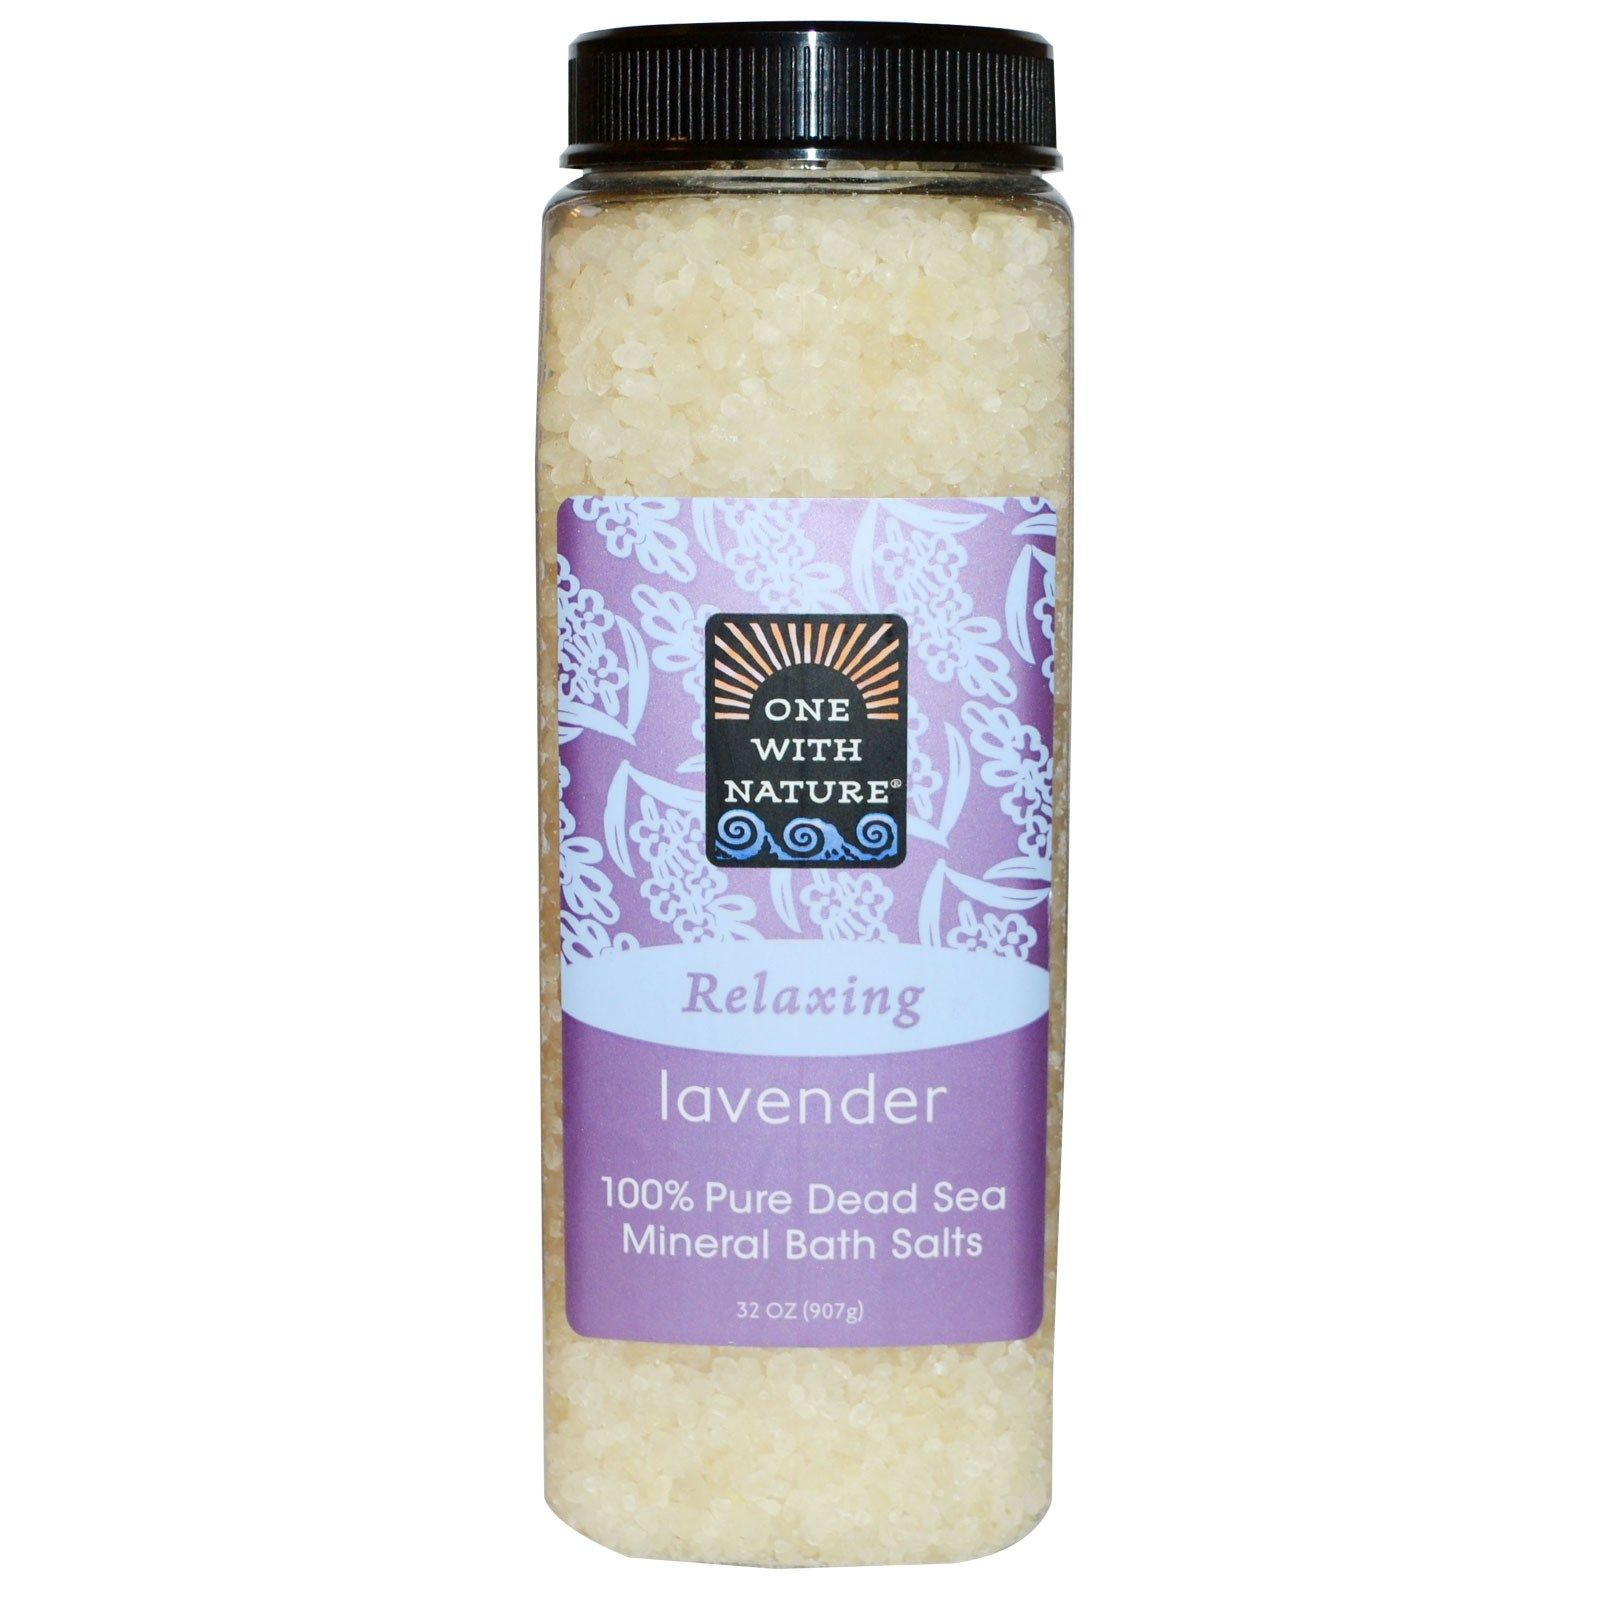 Relaxing Lavender Dead Sea Salts 907g